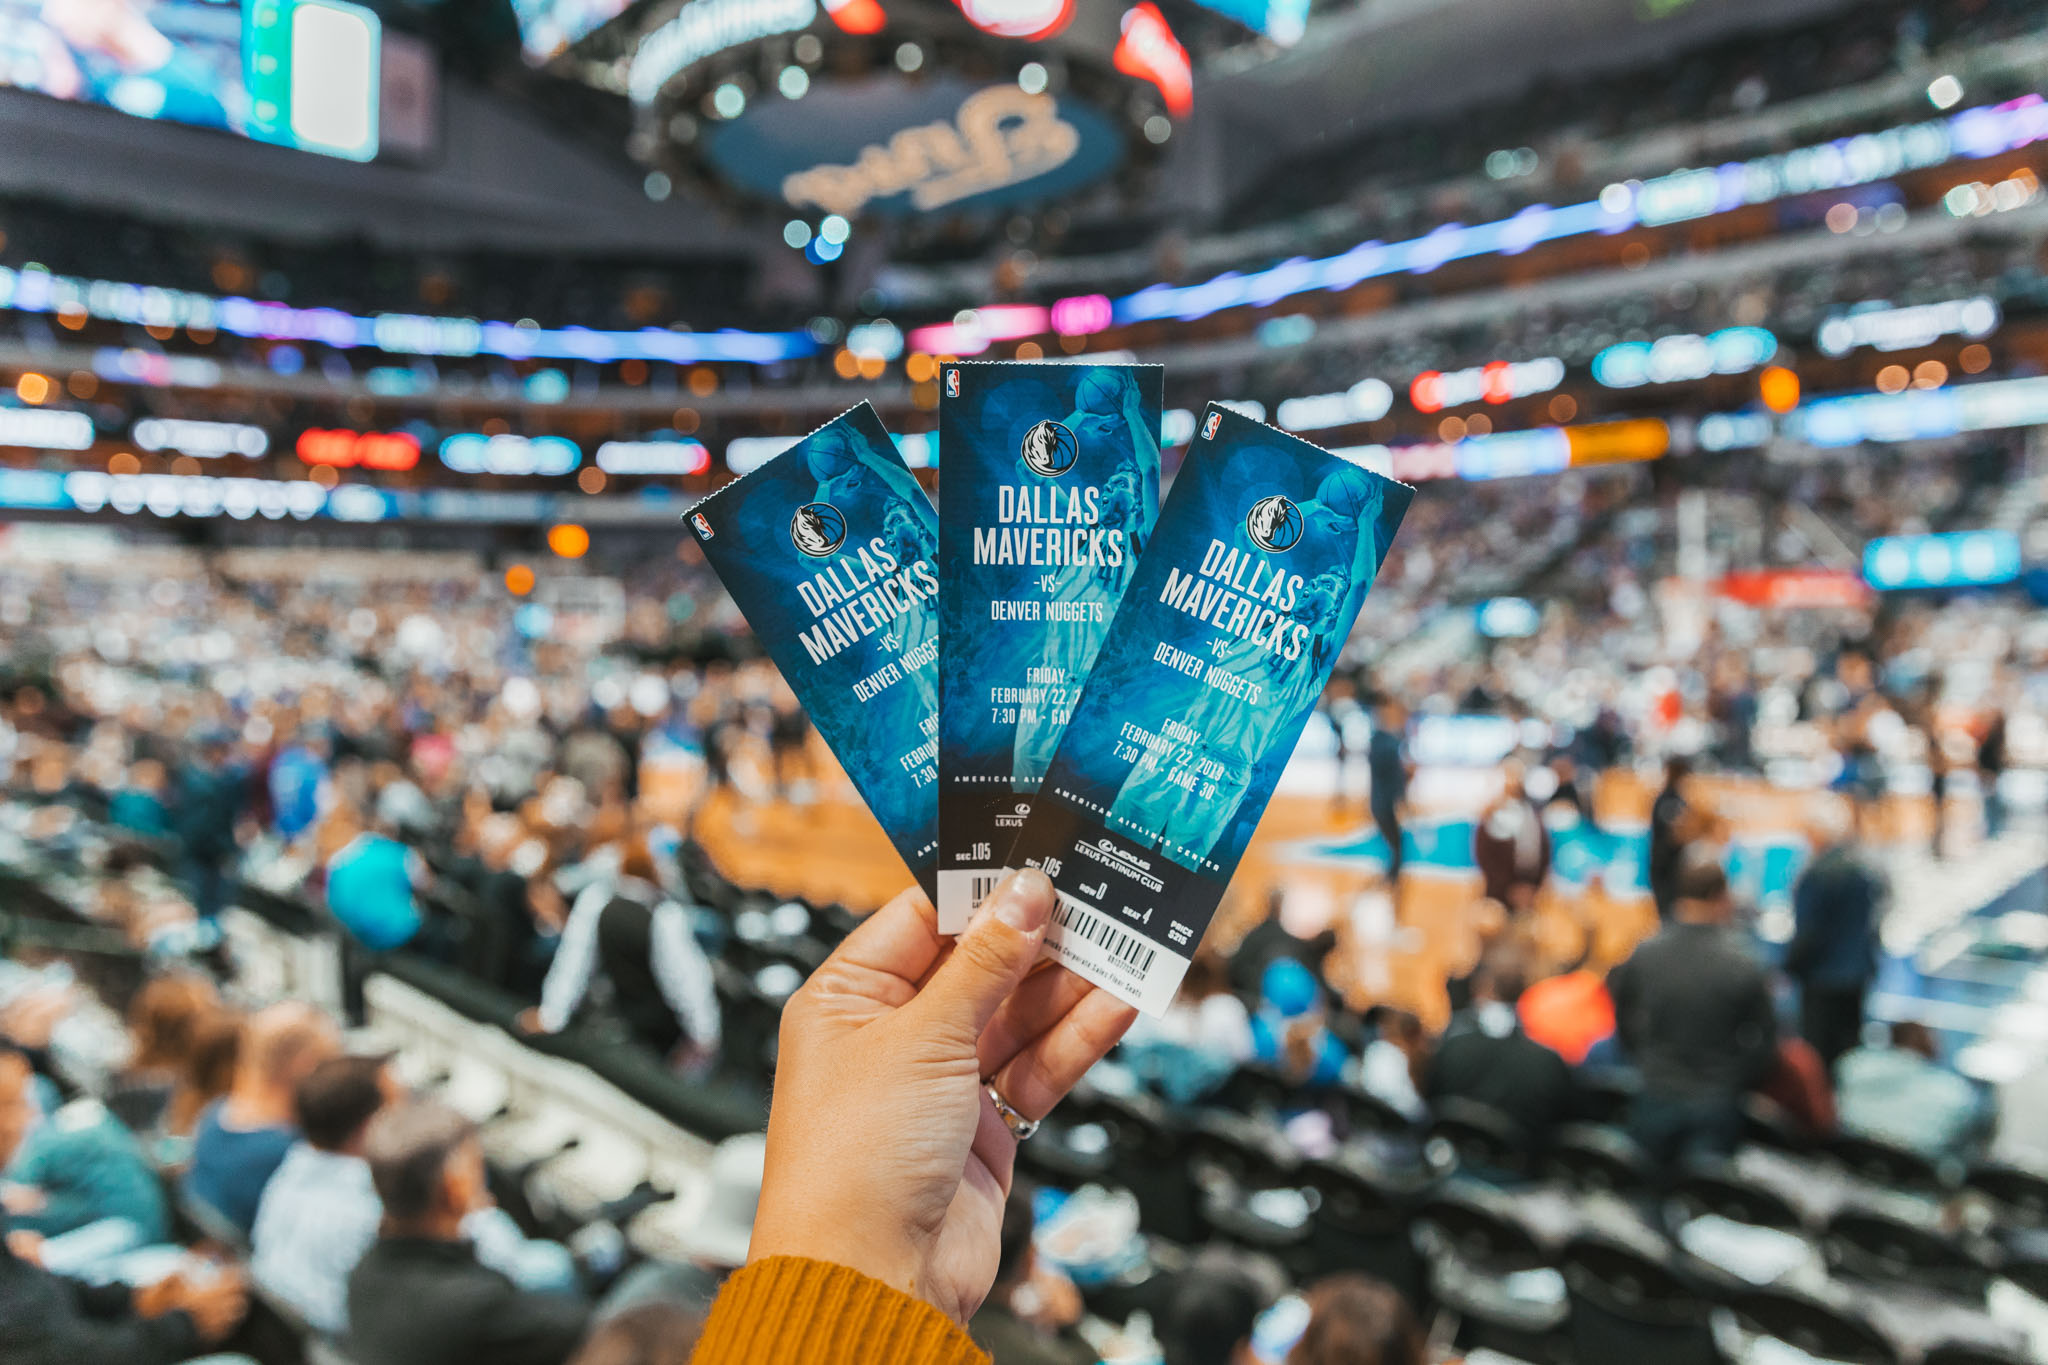 Dallas Mavericks basketball tickets inside the arena